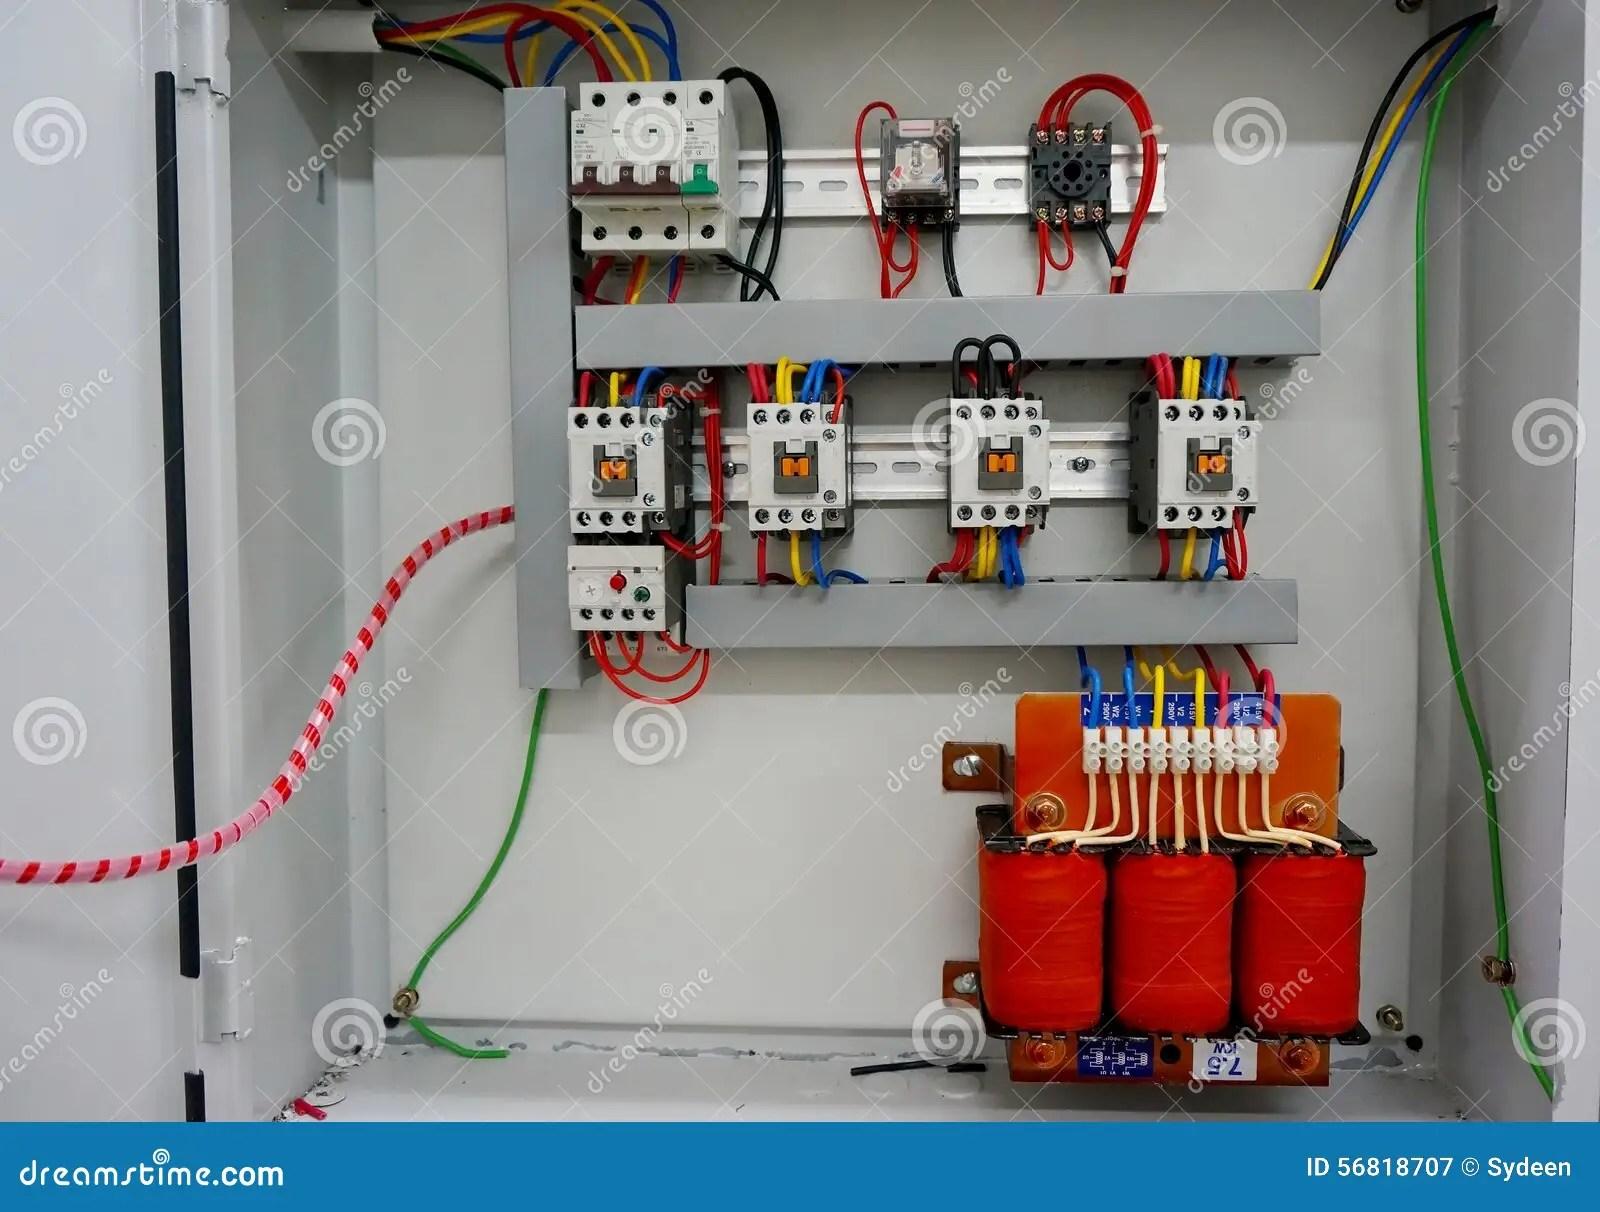 3 phase autotransformer wiring diagram directv swm 5 auto transformer starter stock image of minature